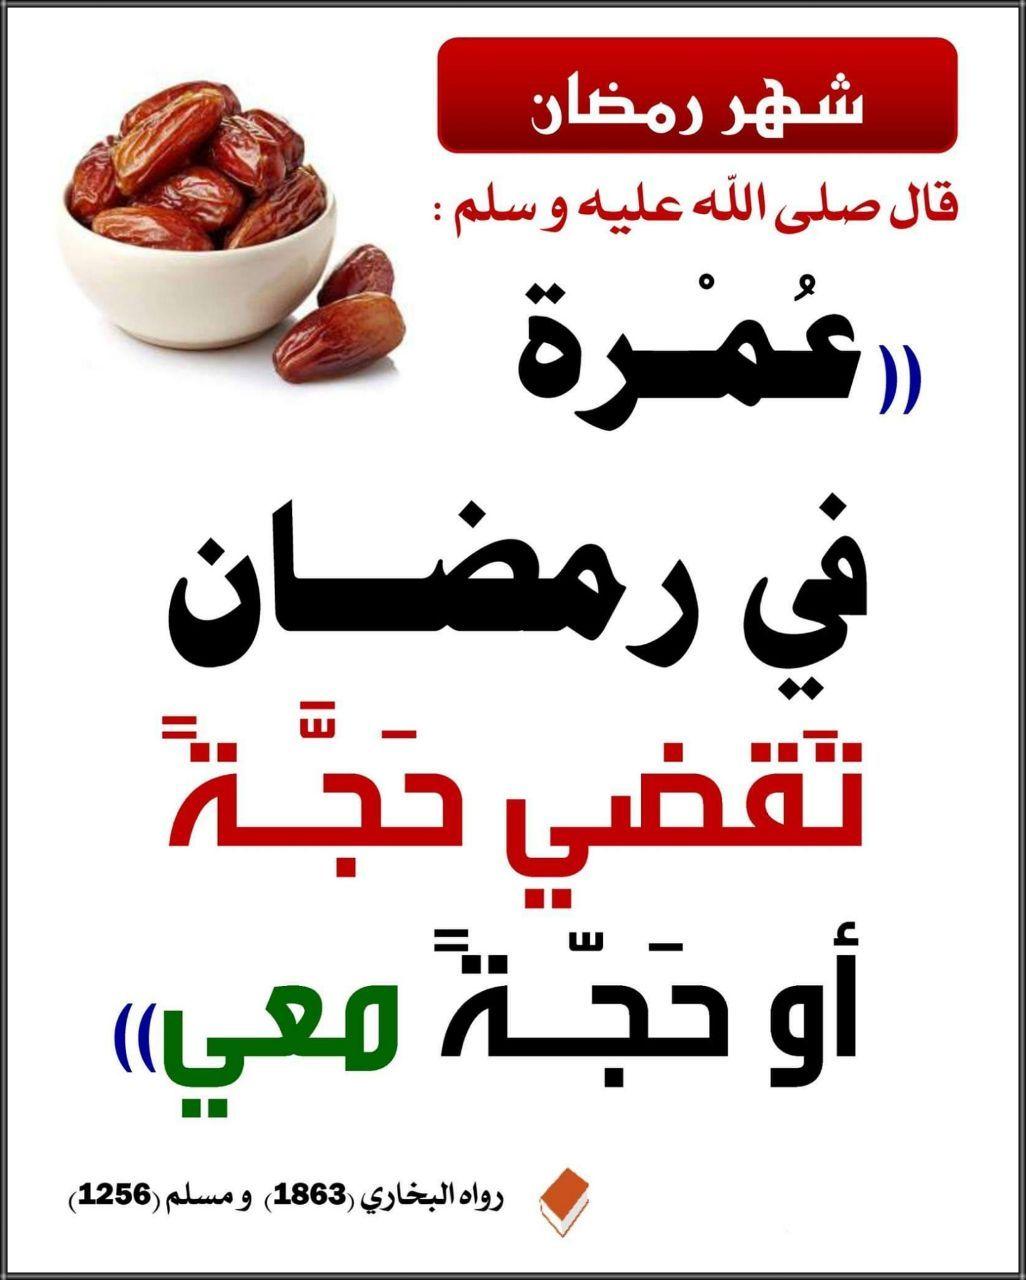 Pin By Saeed On شهر رمضان Hadith Ahadith Islamic Quotes